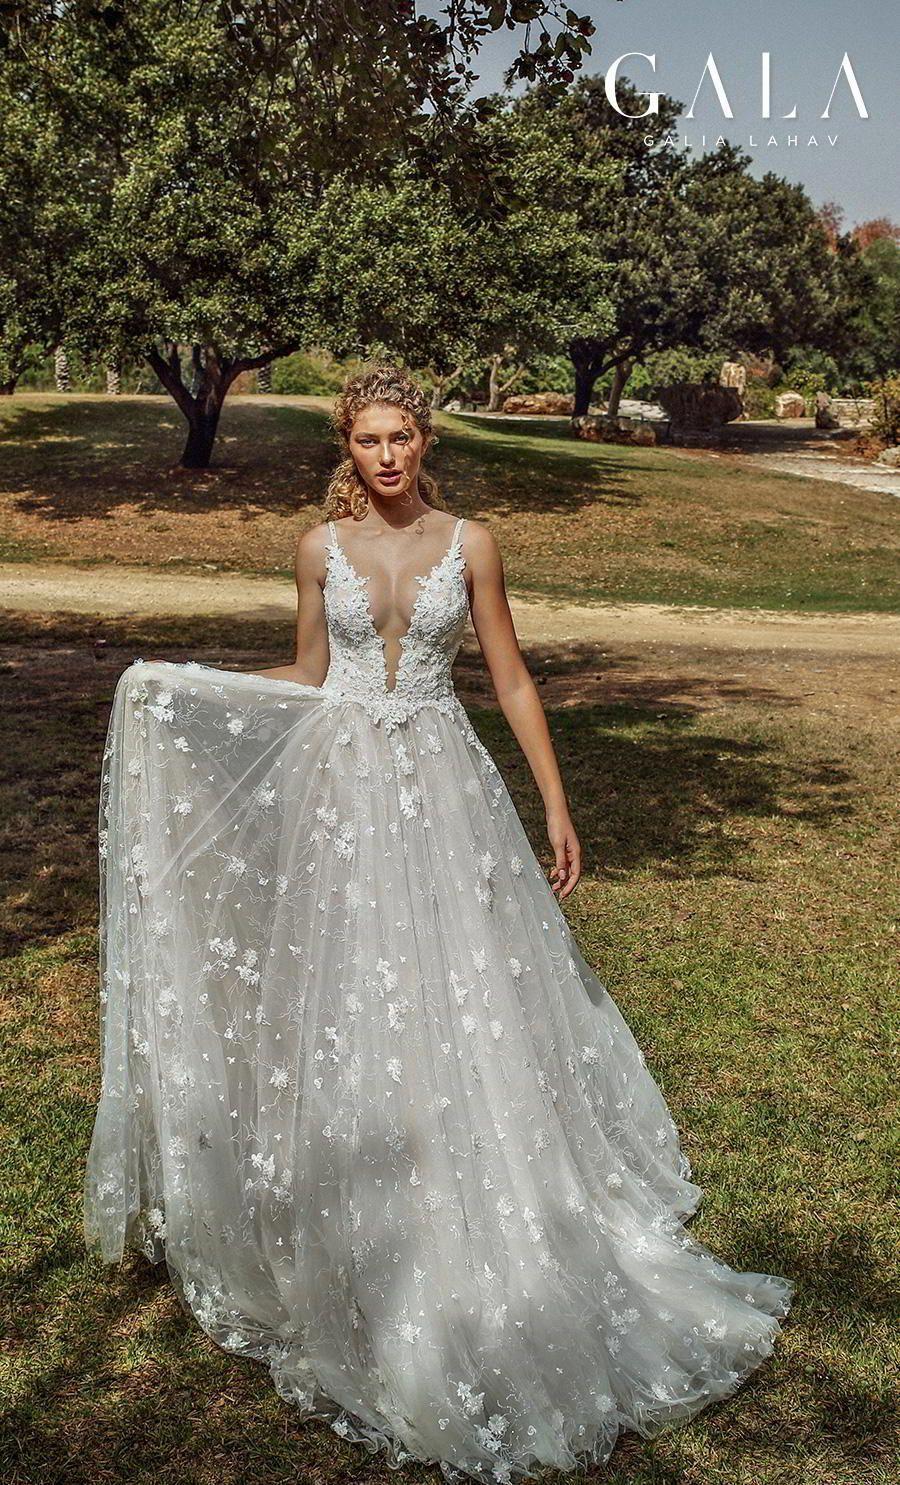 GALA by Galia Lahav Collection No. VI — These Wedding